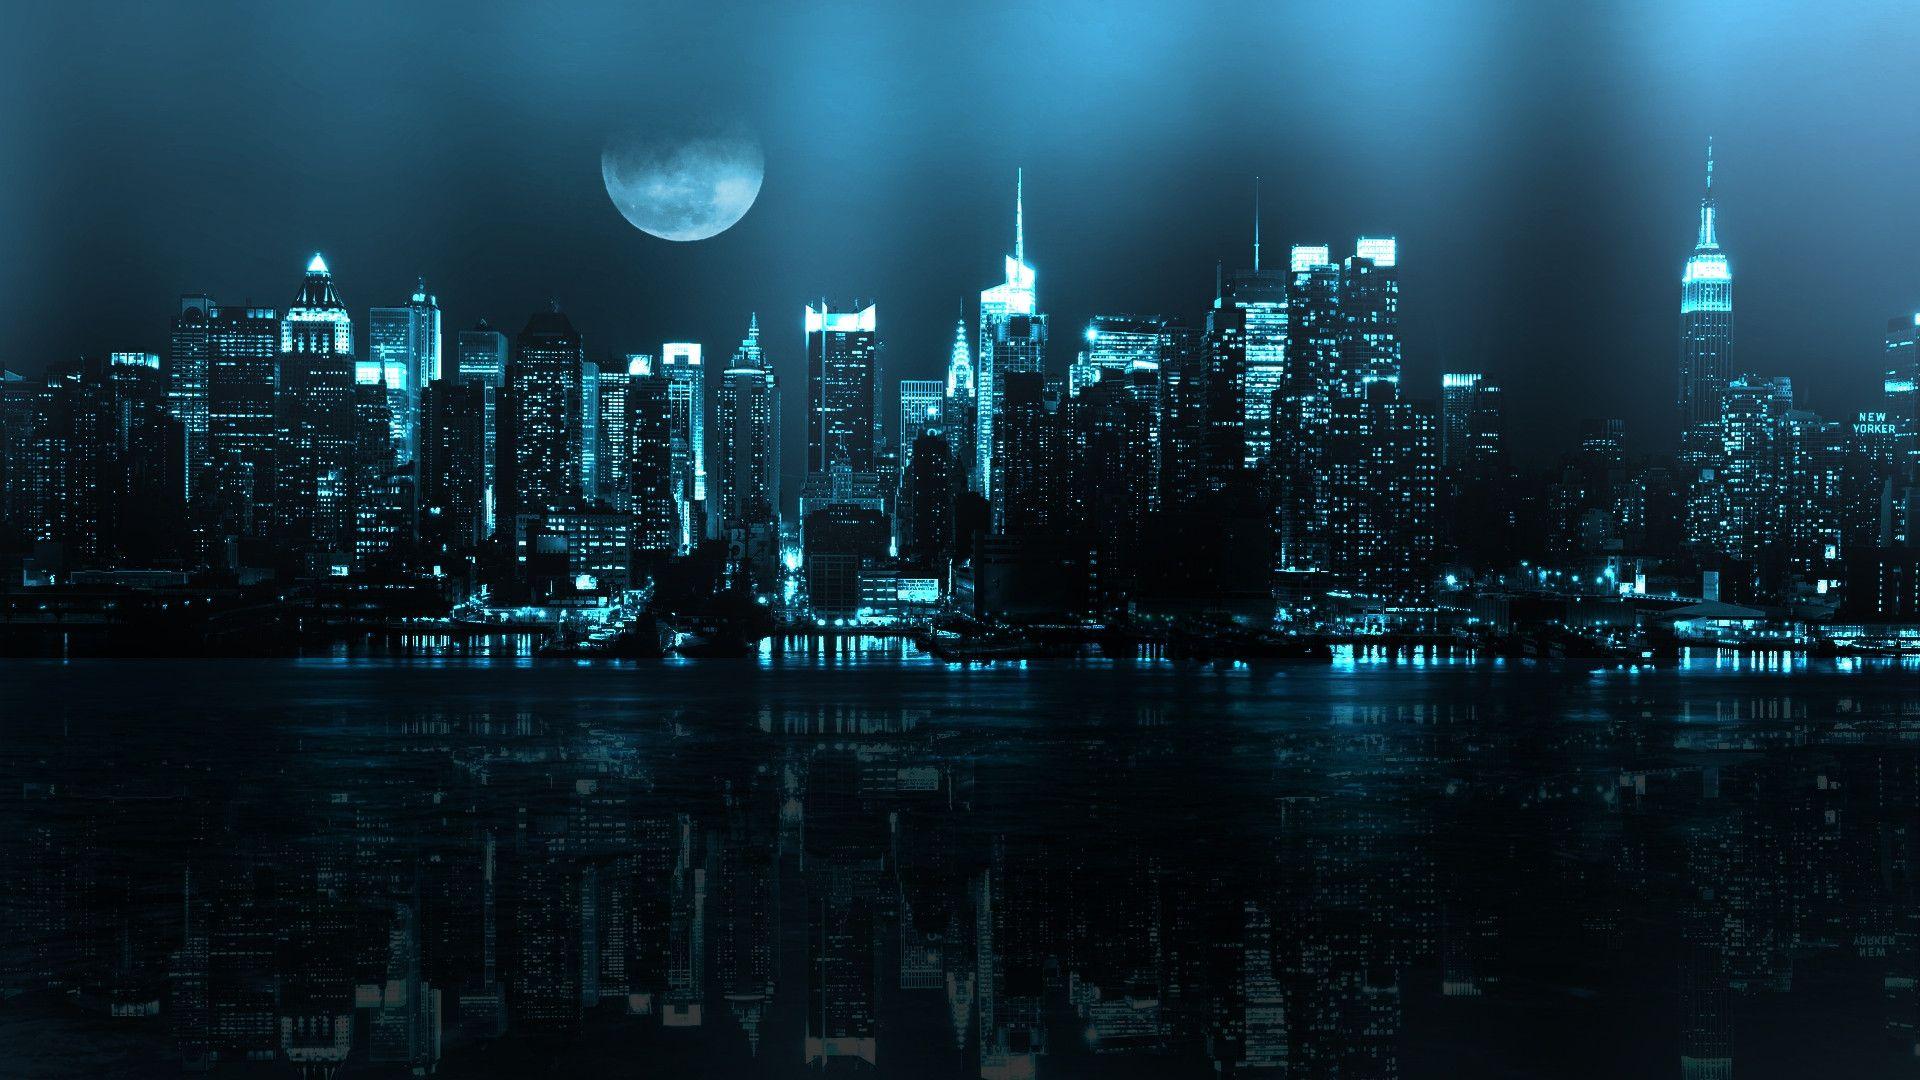 Best Desktop Wallpaper For Productivity Cityscape